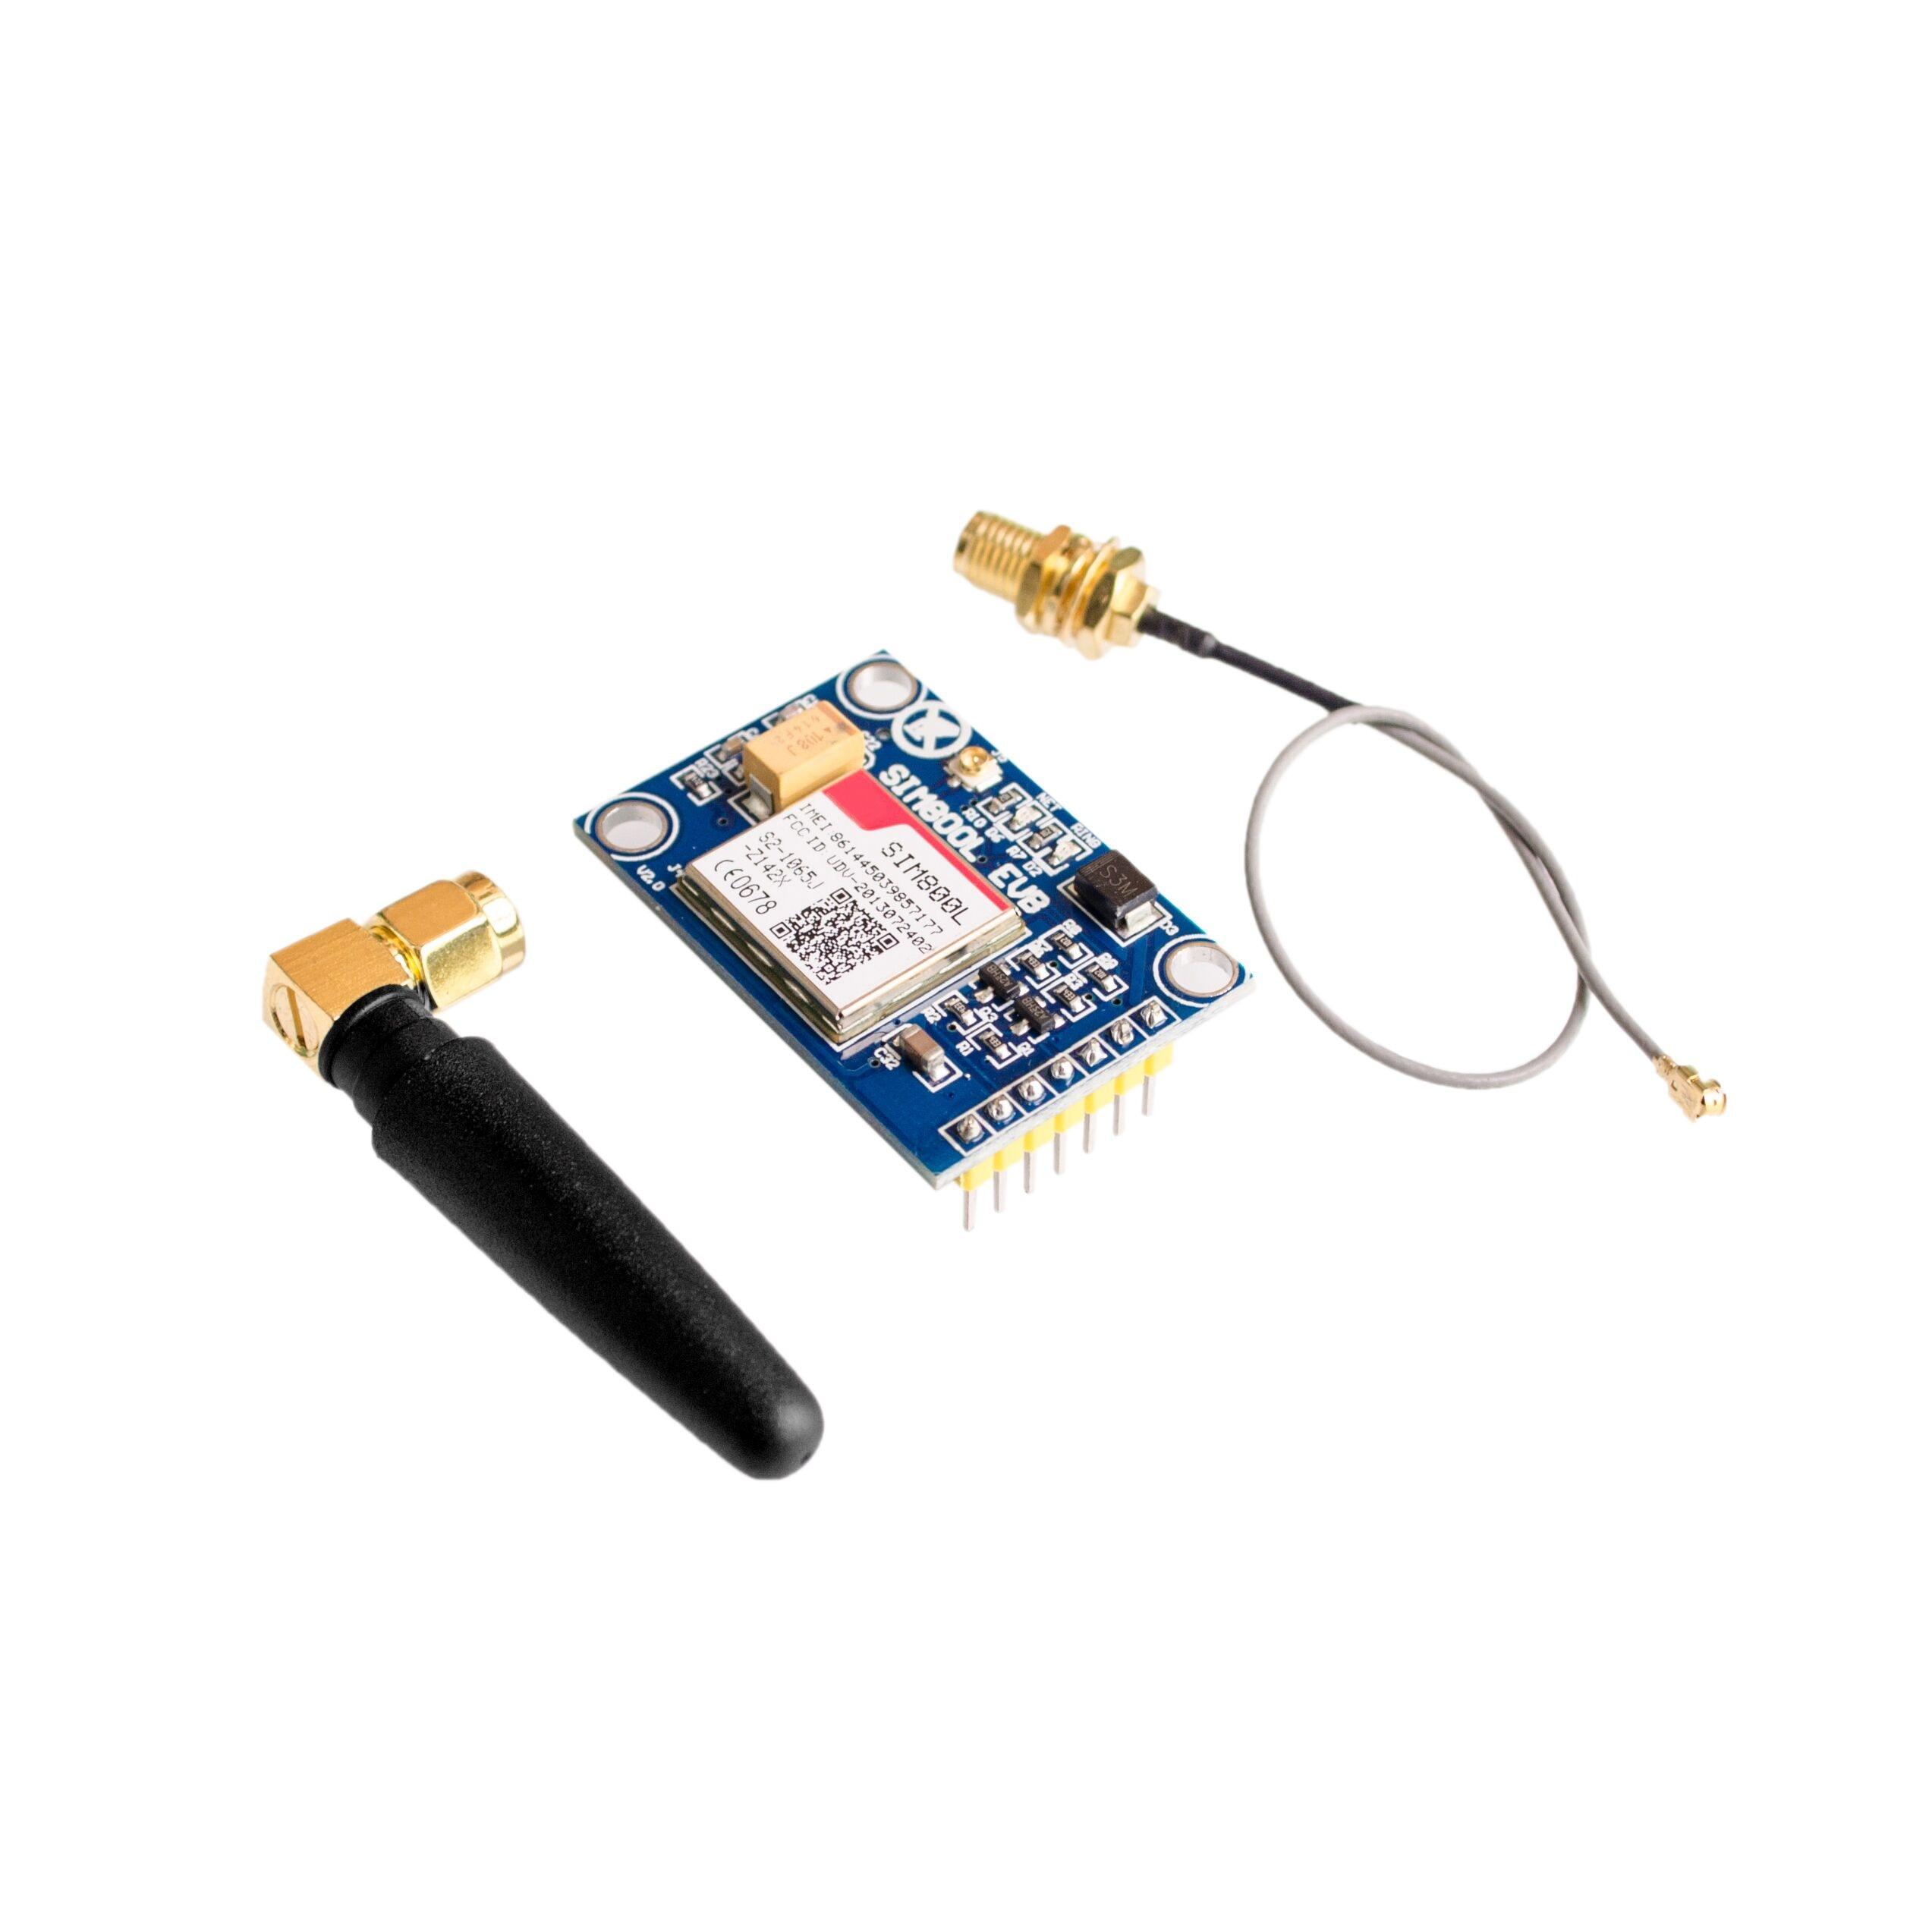 SIM800L V2.0 5V Wireless GSM GPRS MODULE Quad-Band W- Antenna Cable Cap